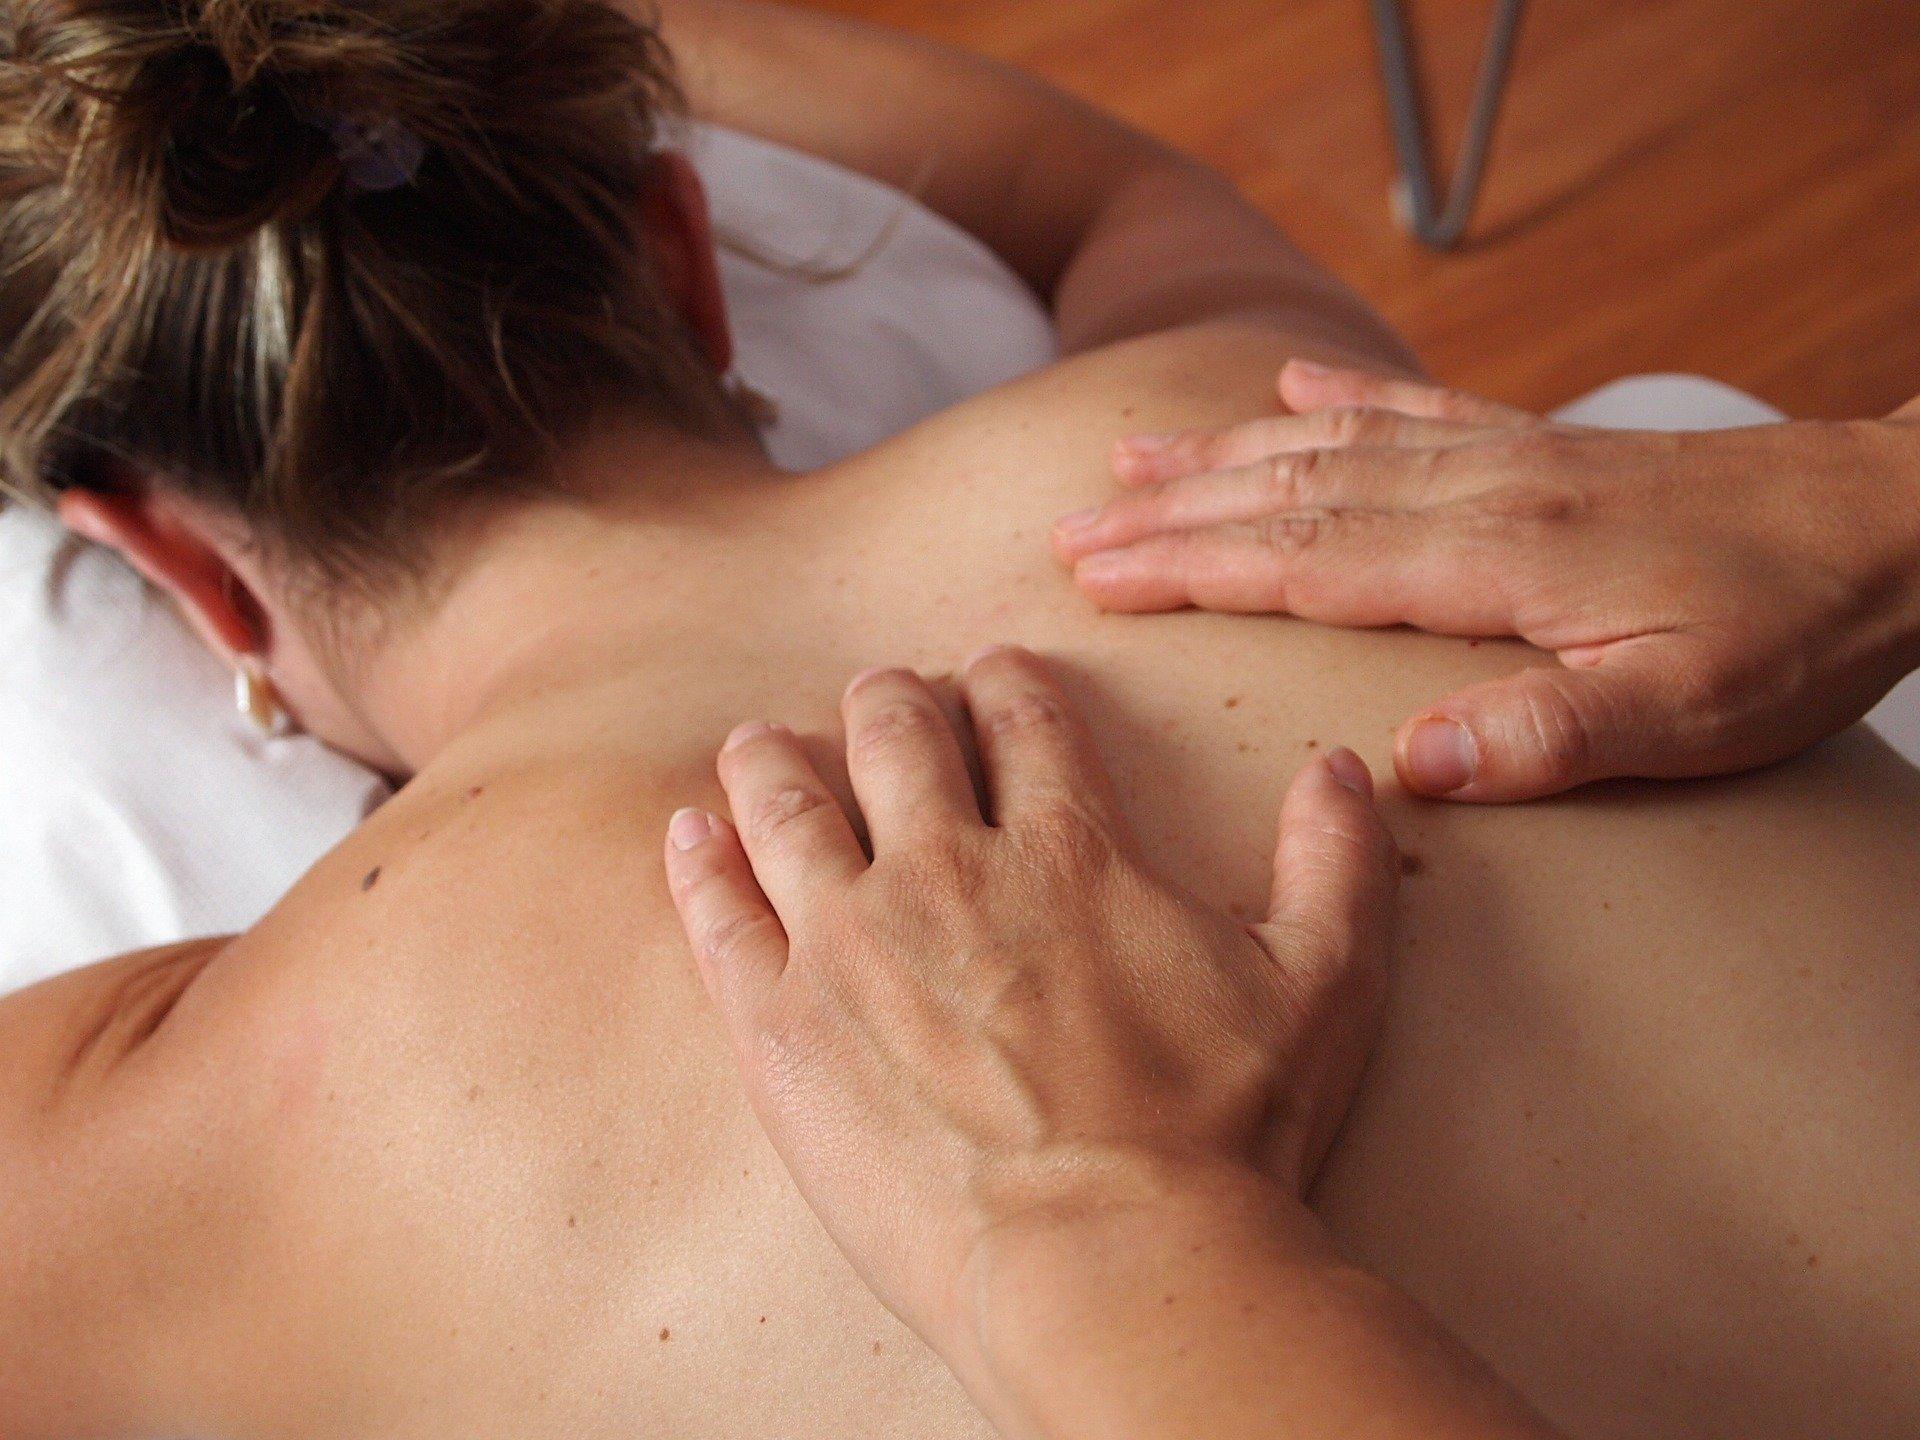 Asian Massage Parlor Near Me